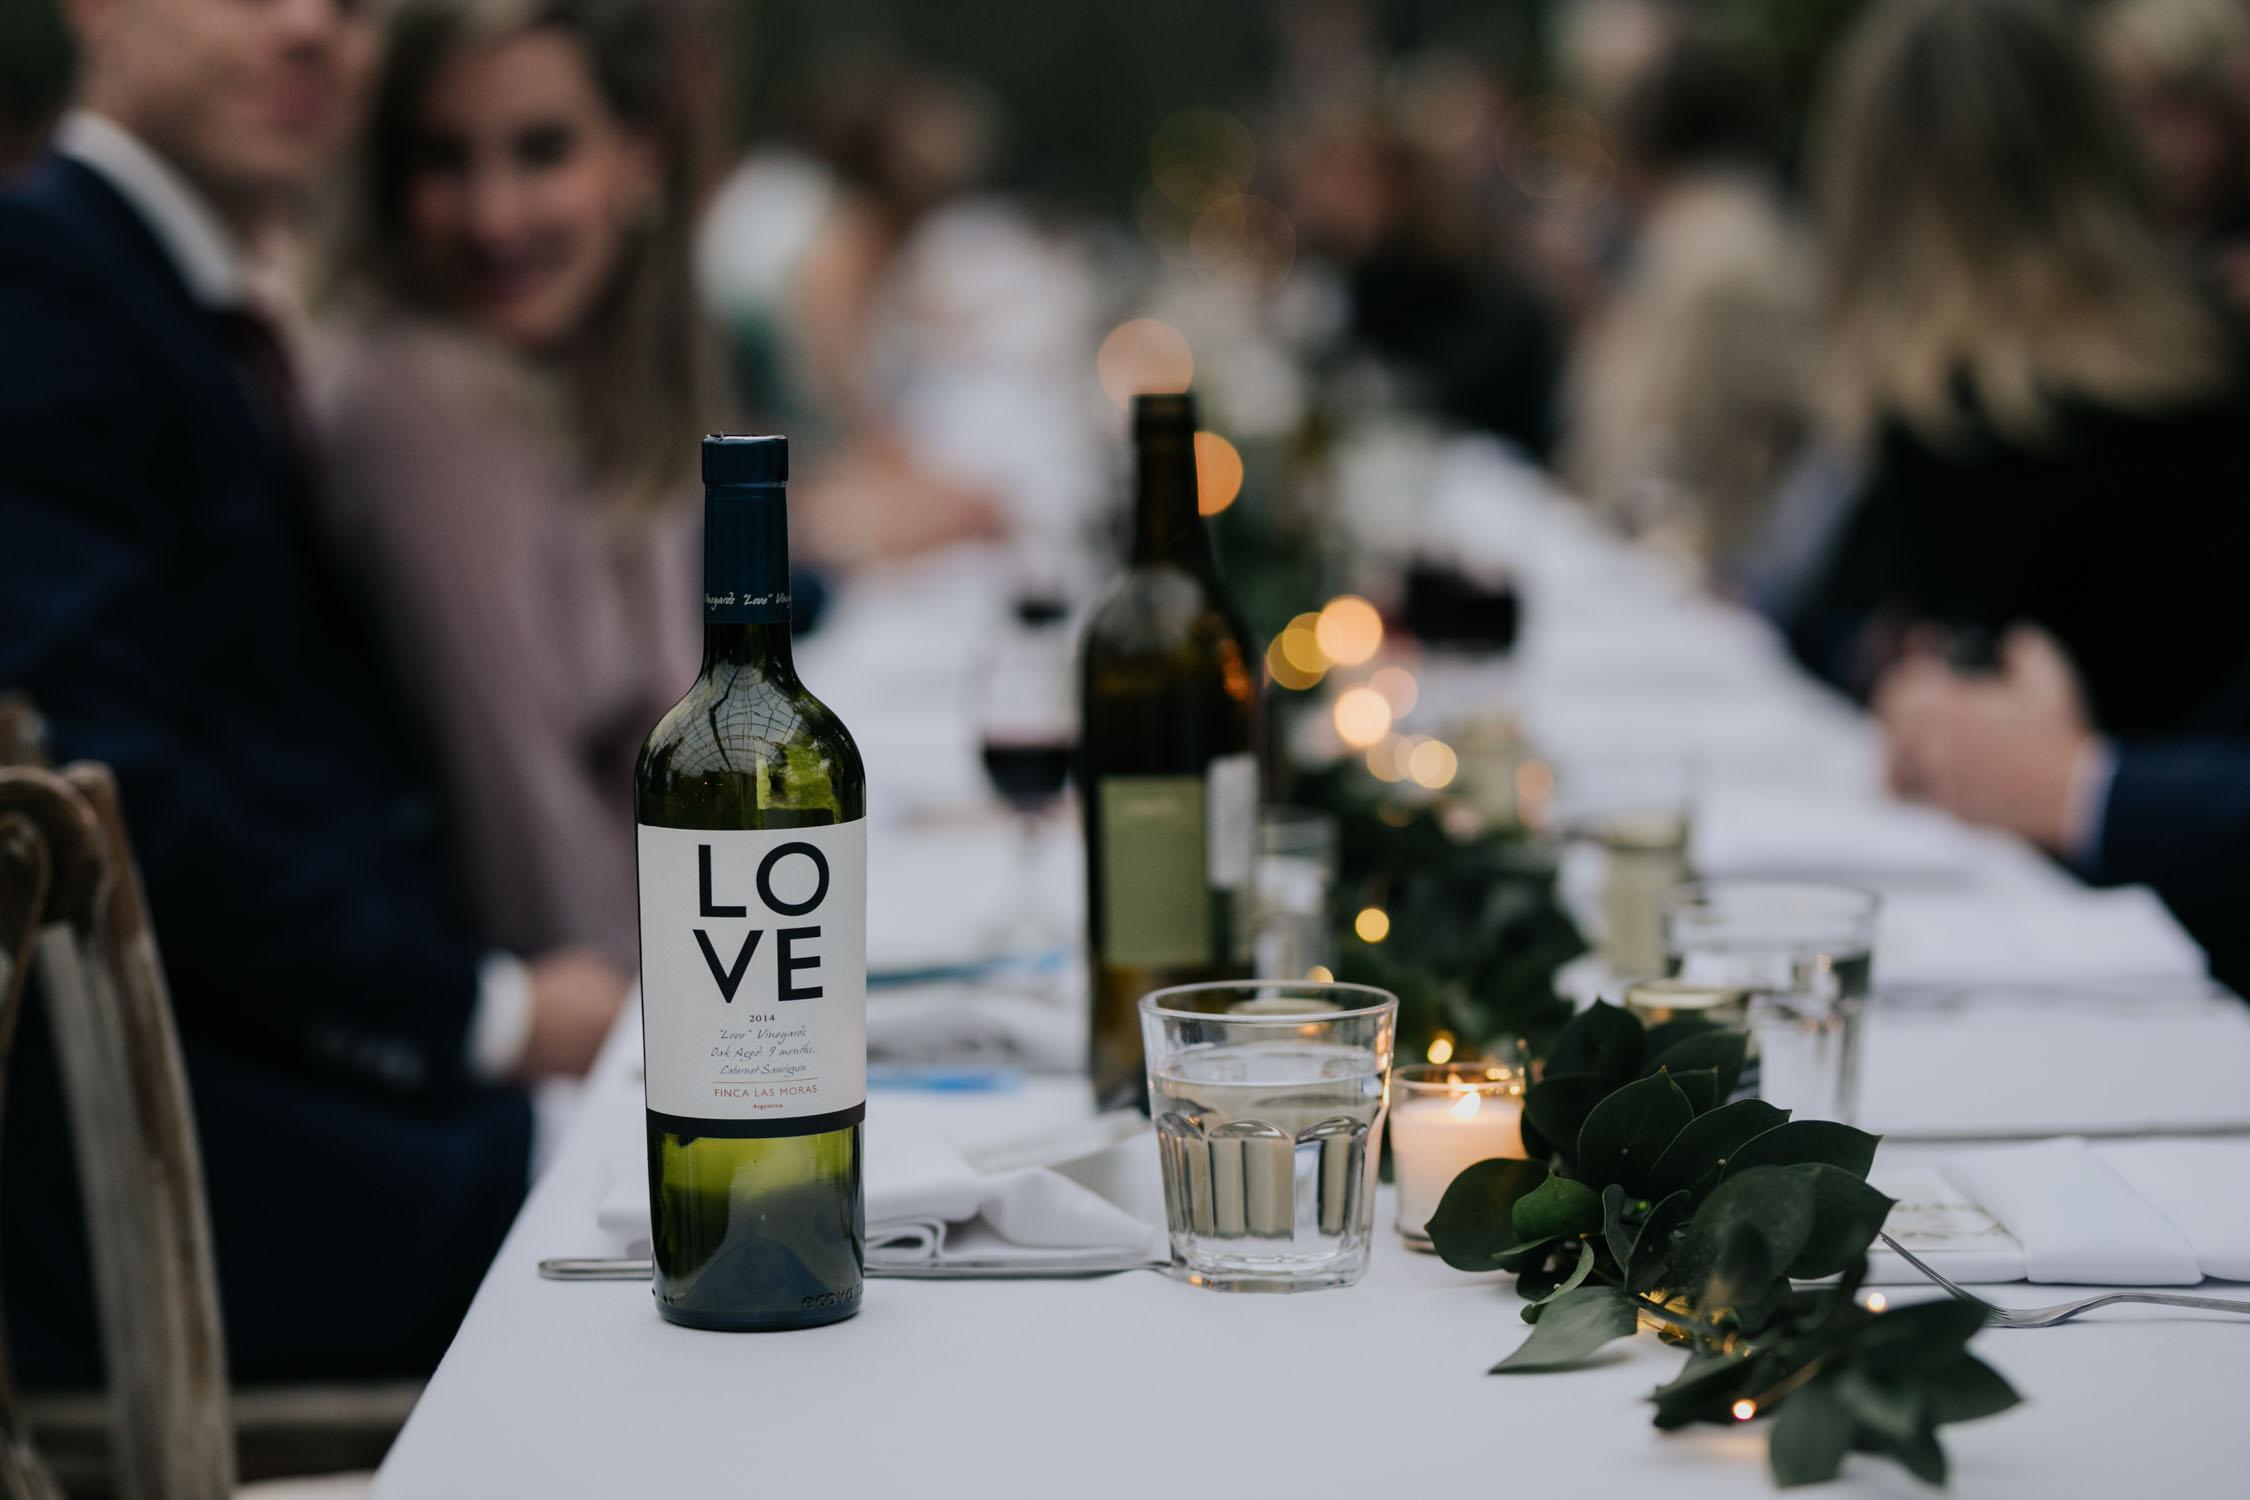 Love wine served at Saskatoon Farm Wedding Venue in Calgary, Alberta.